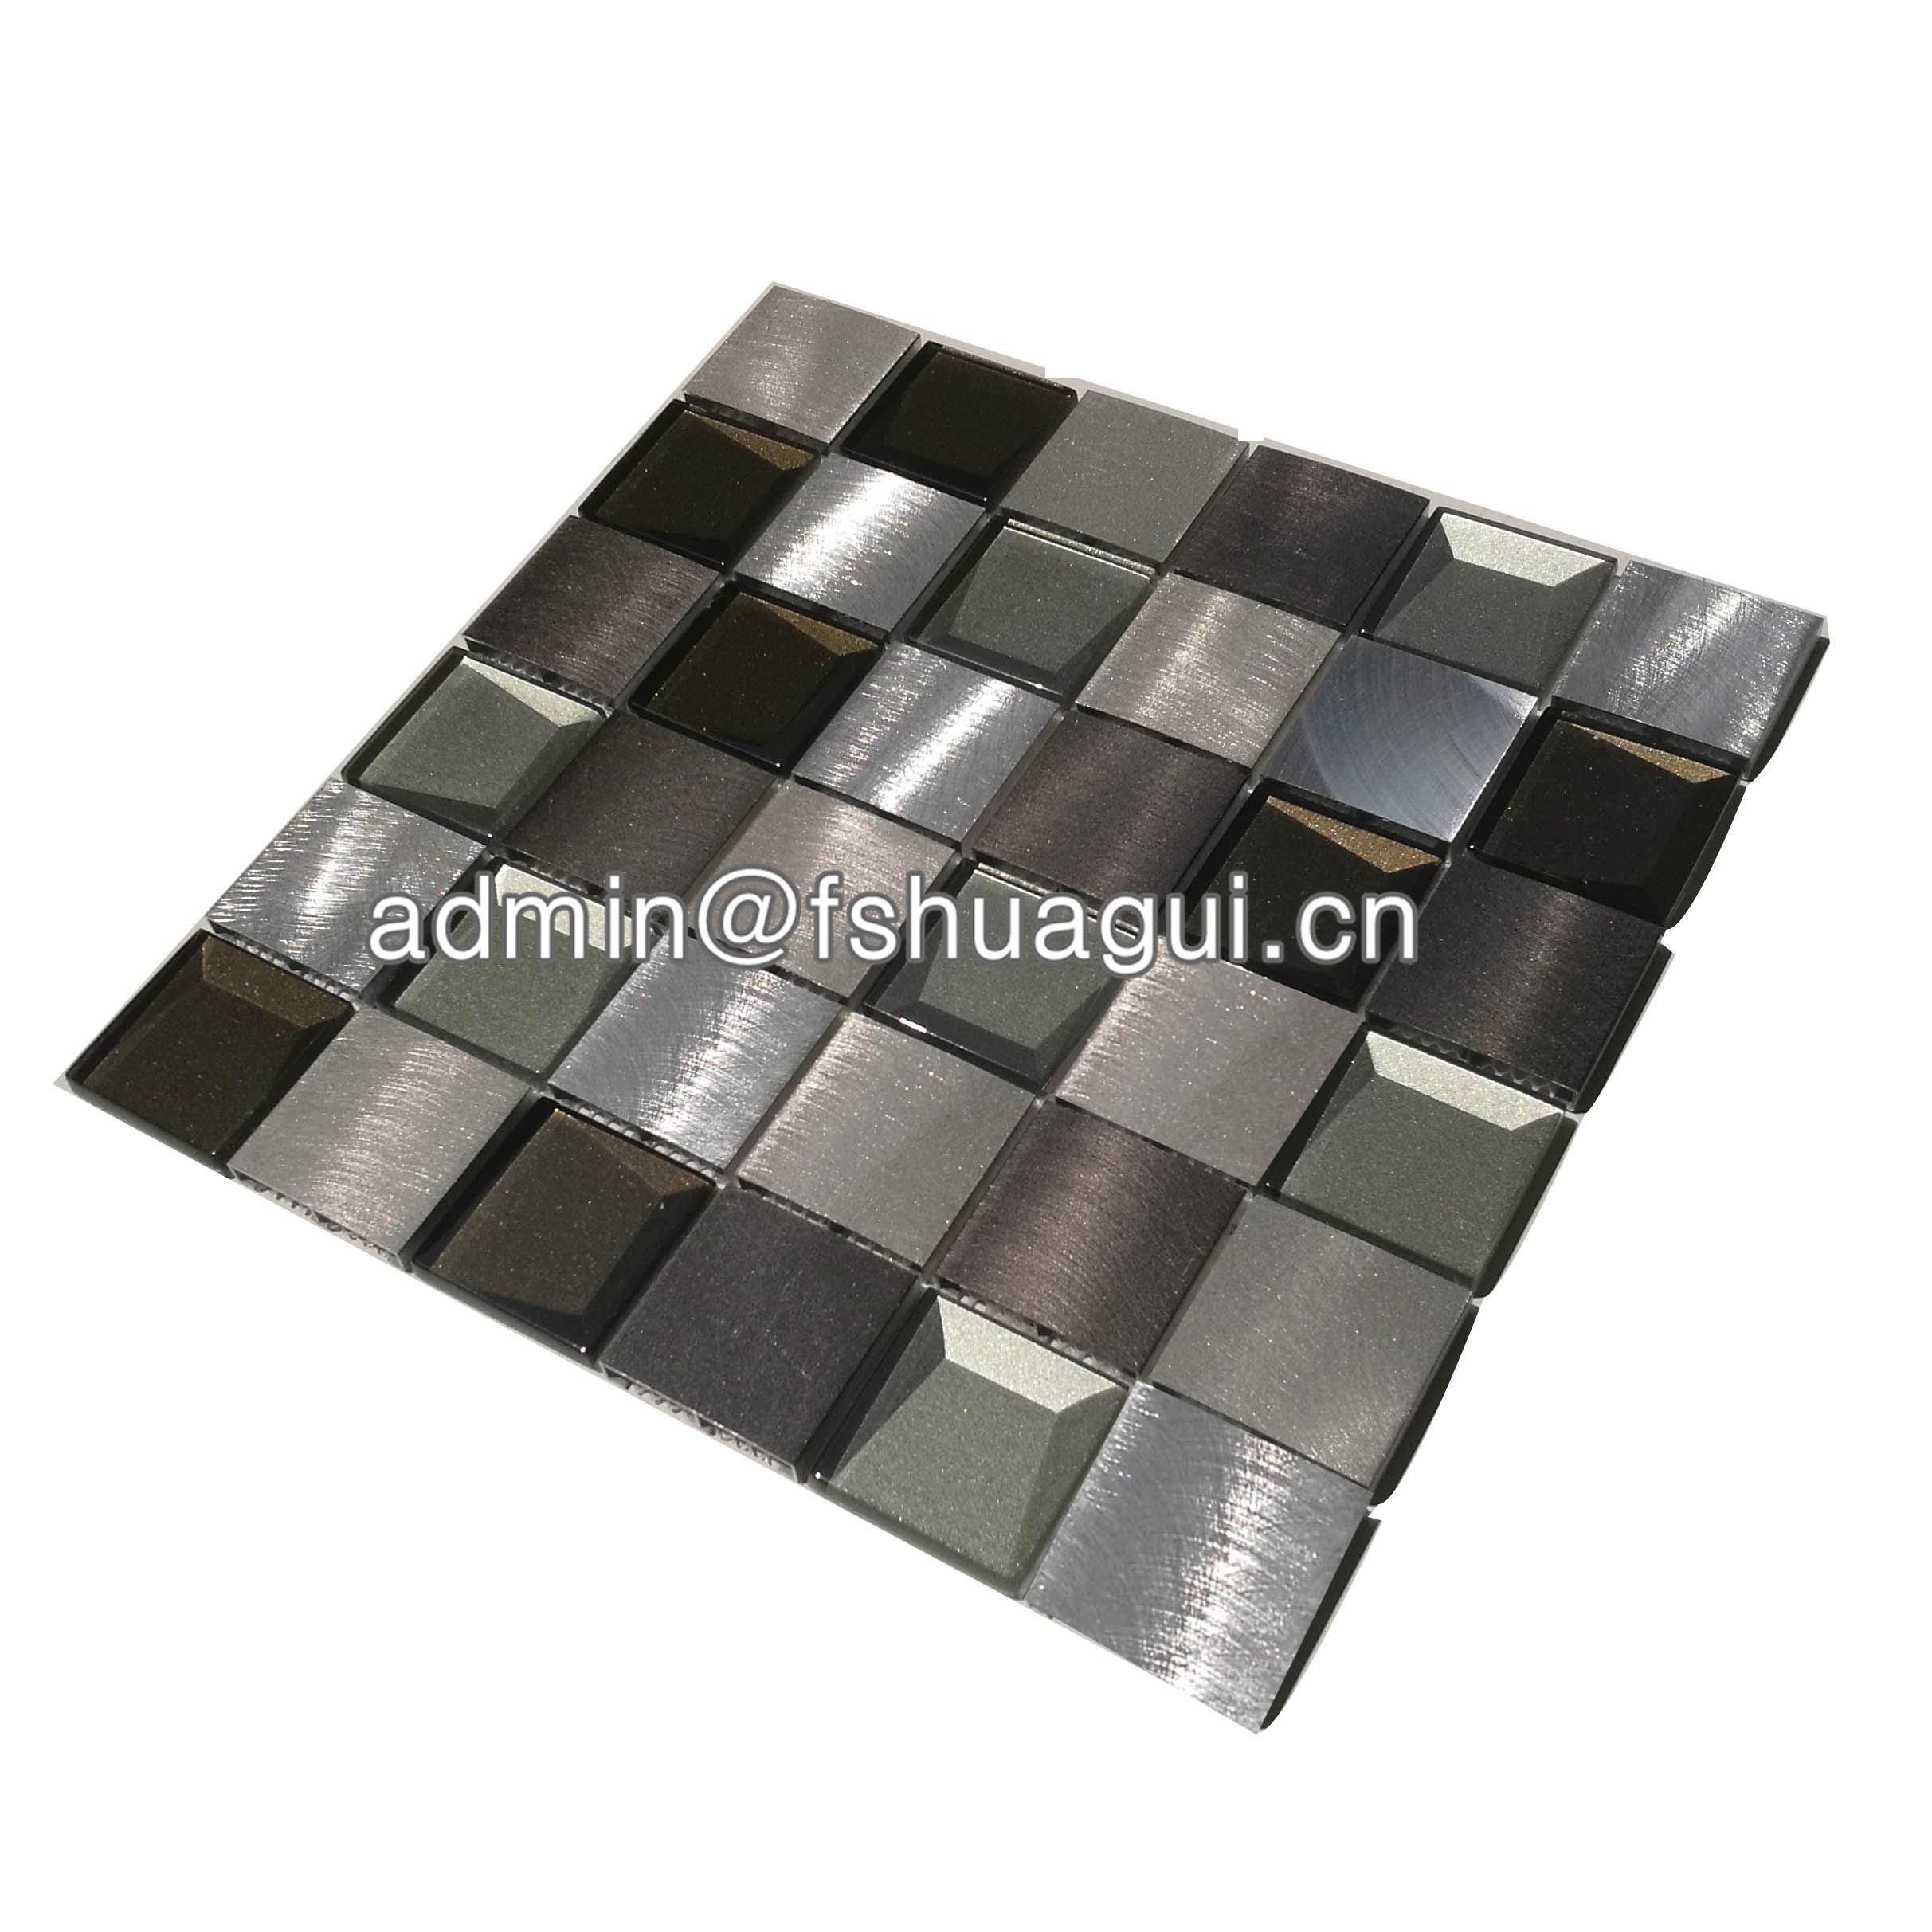 Huagui Rustic Panel Wood Mosaic factory   HG-WT001 WOOD MOSAIC TILE image1